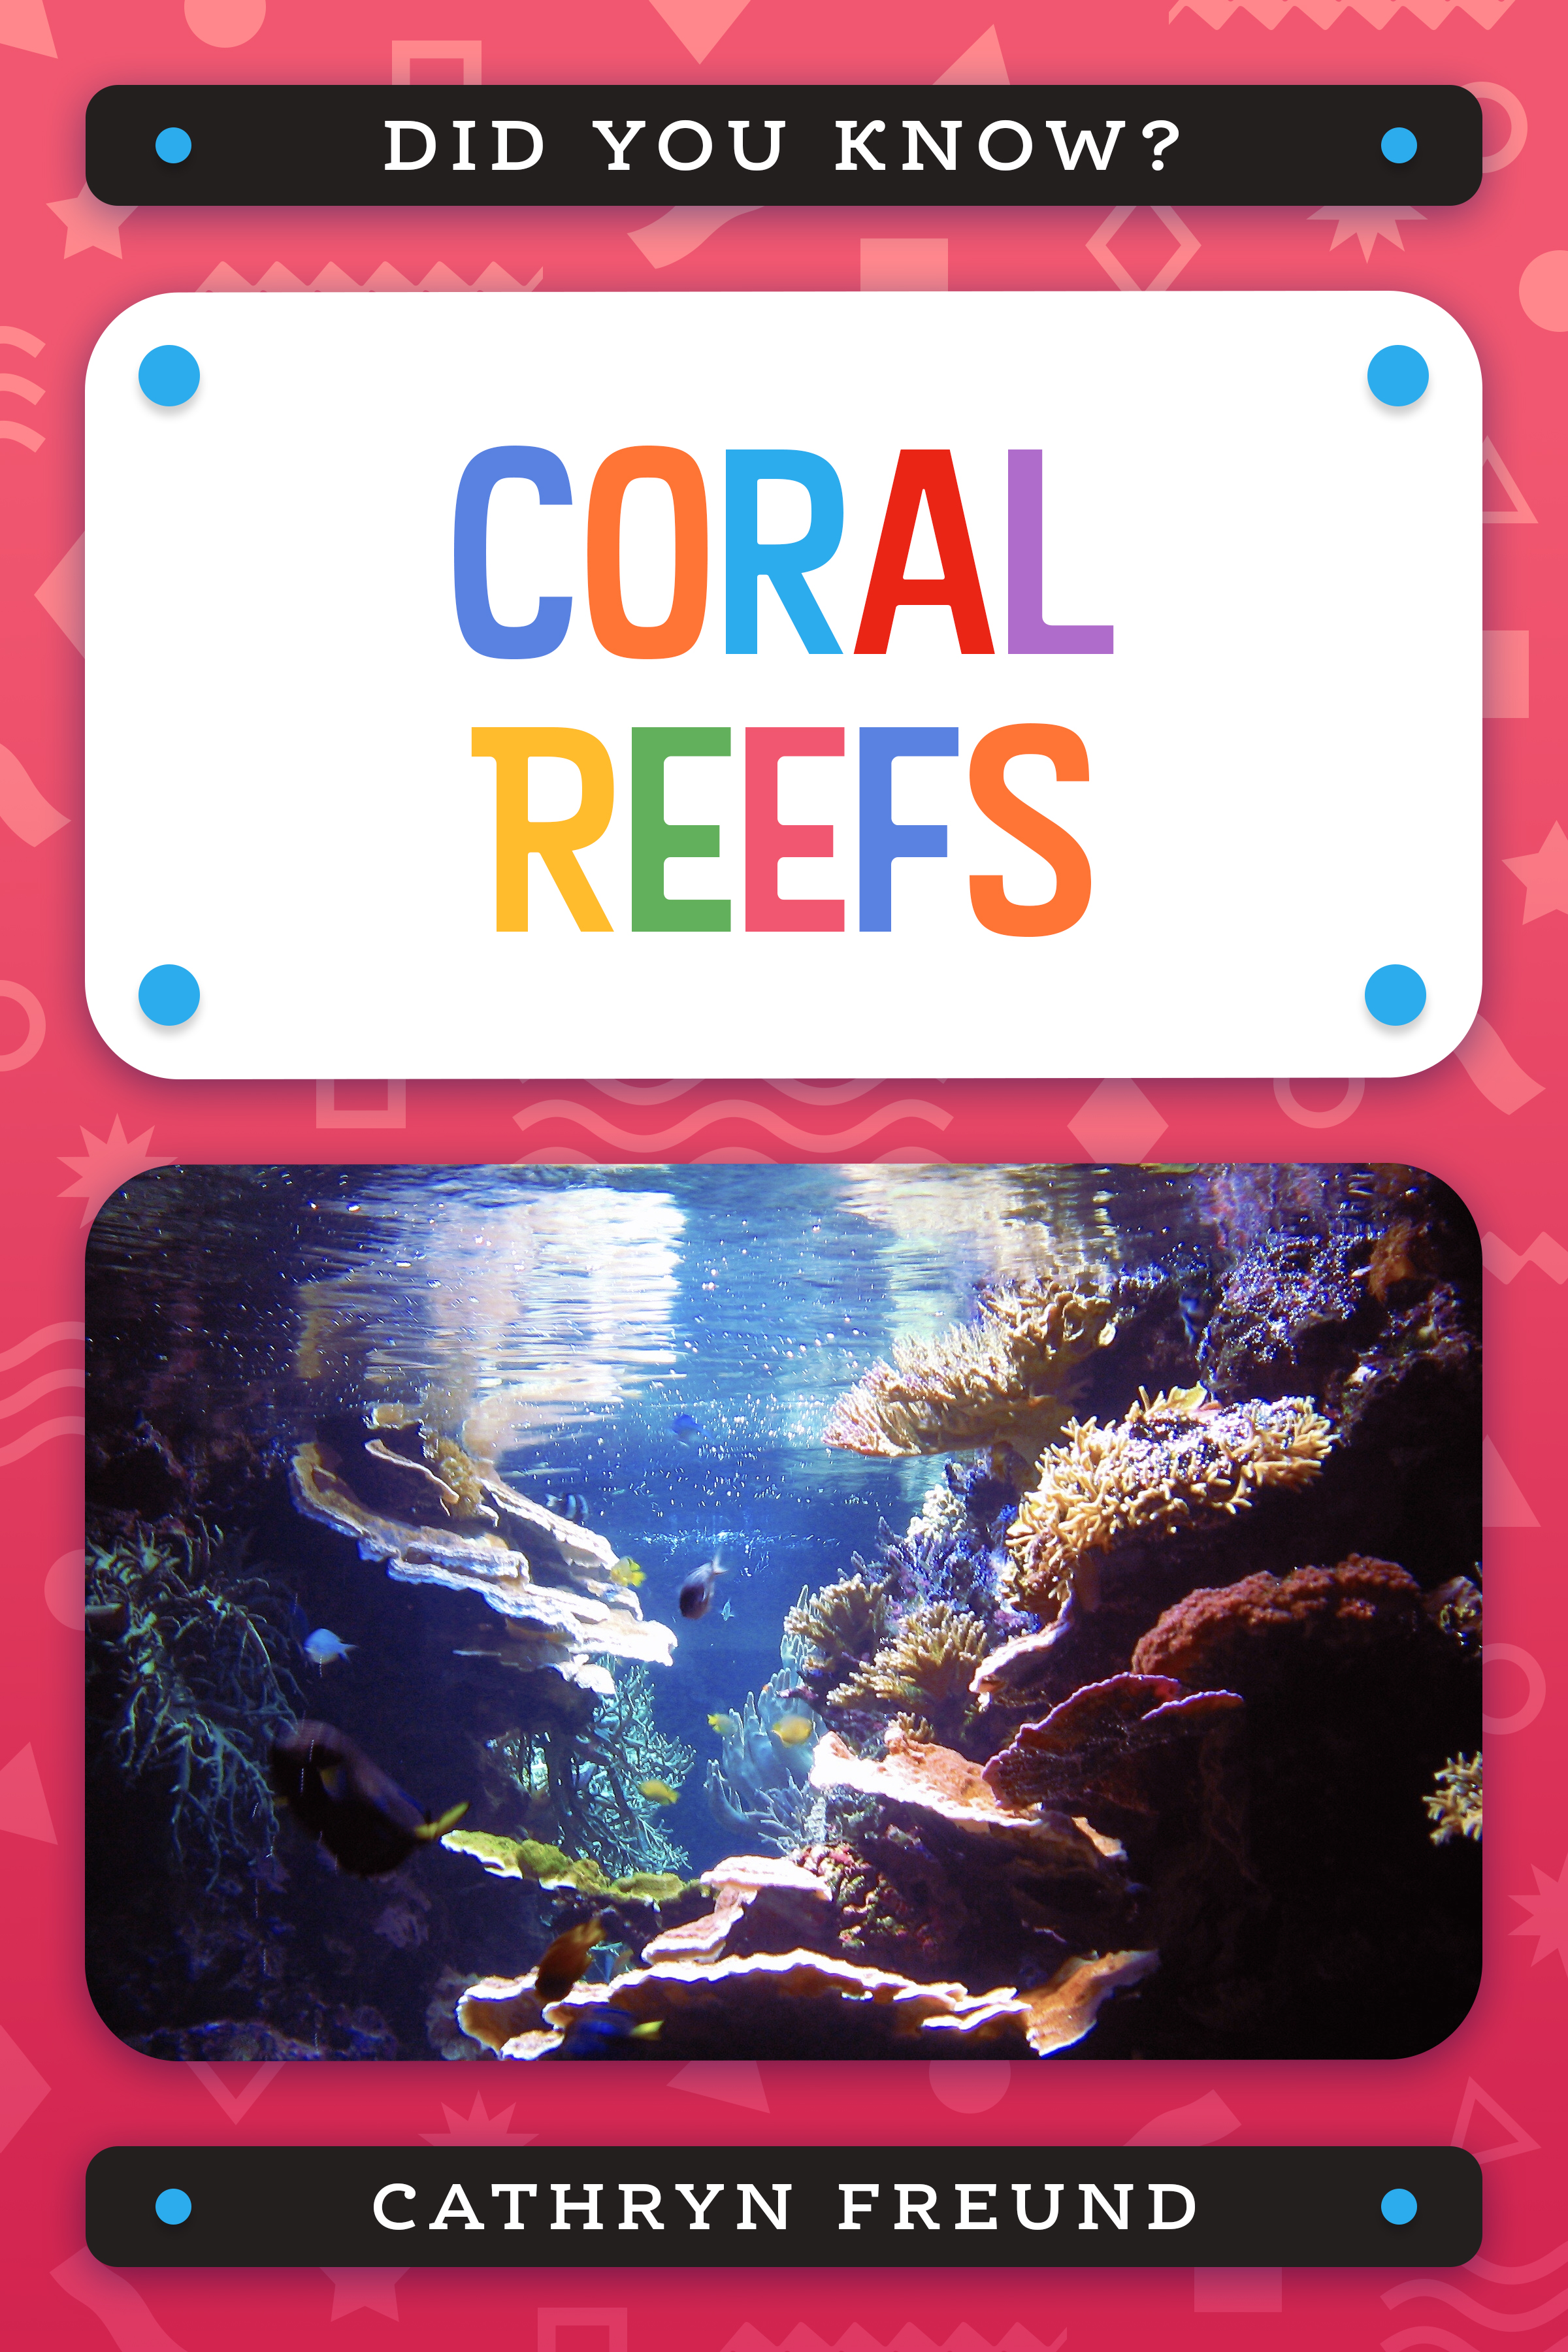 CoralReefs.jpg